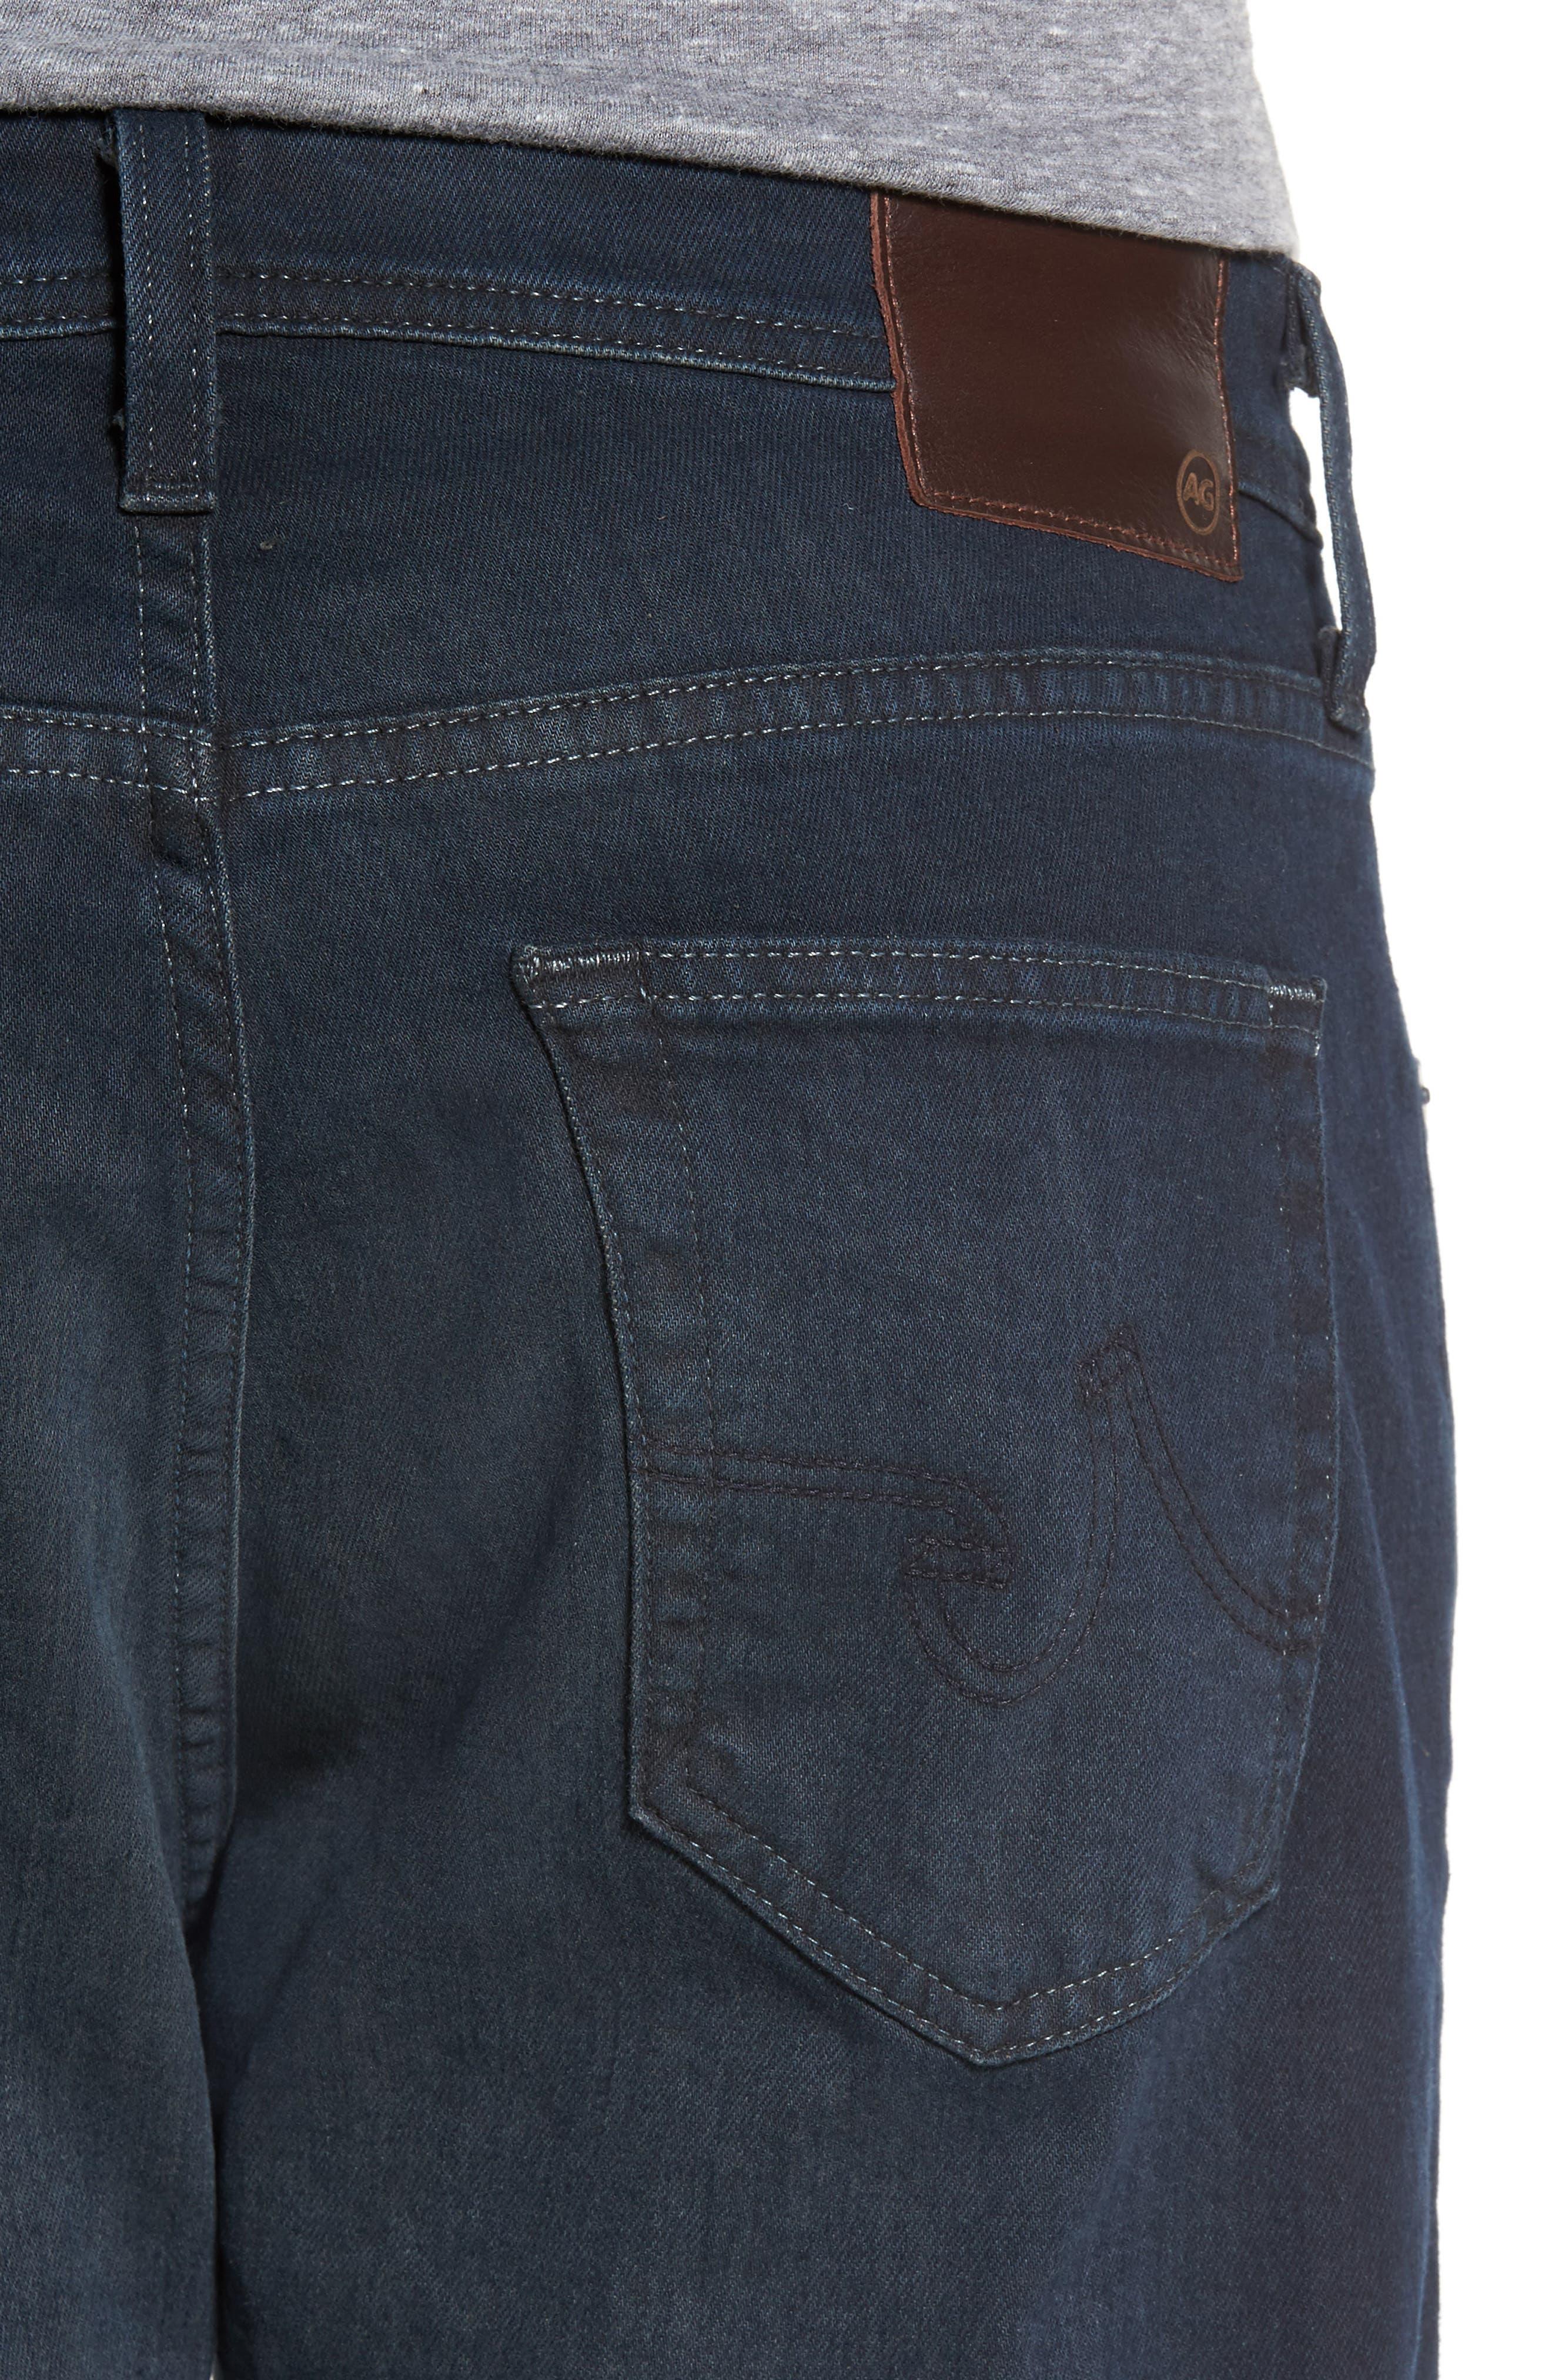 Ives Straight Fit Jeans,                             Alternate thumbnail 4, color,                             Blue Smolder